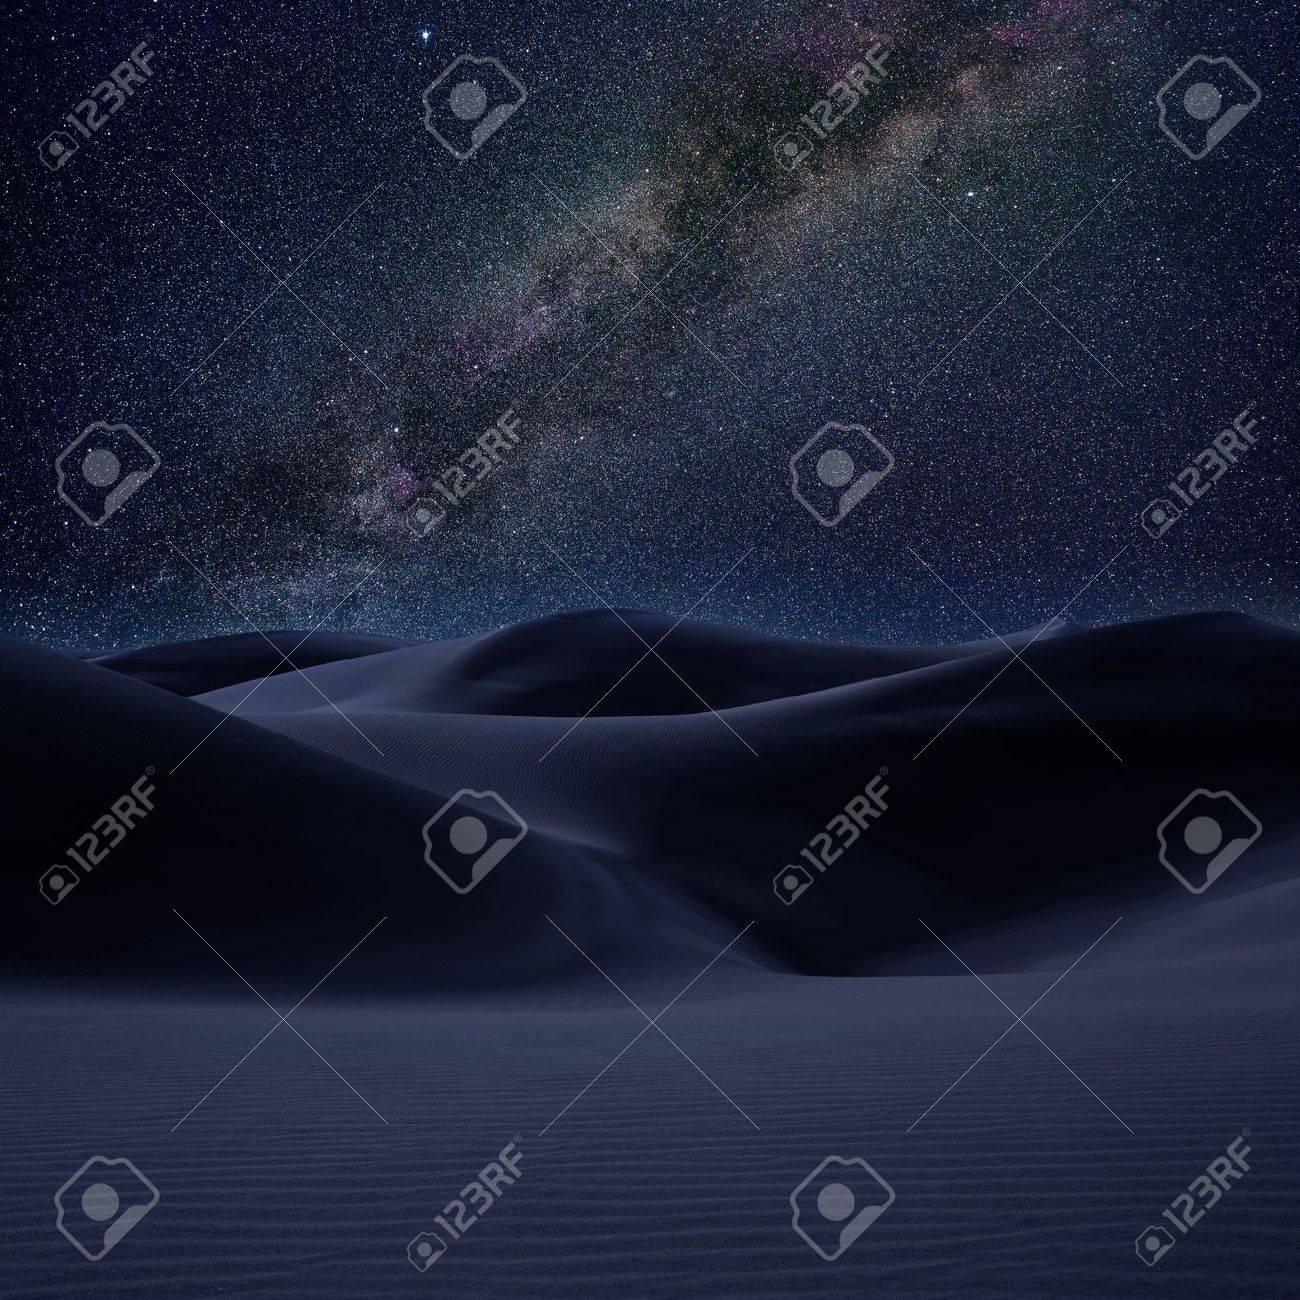 Desert dunes sand in milky way stars night sky photo mount Stock Photo - 15116403